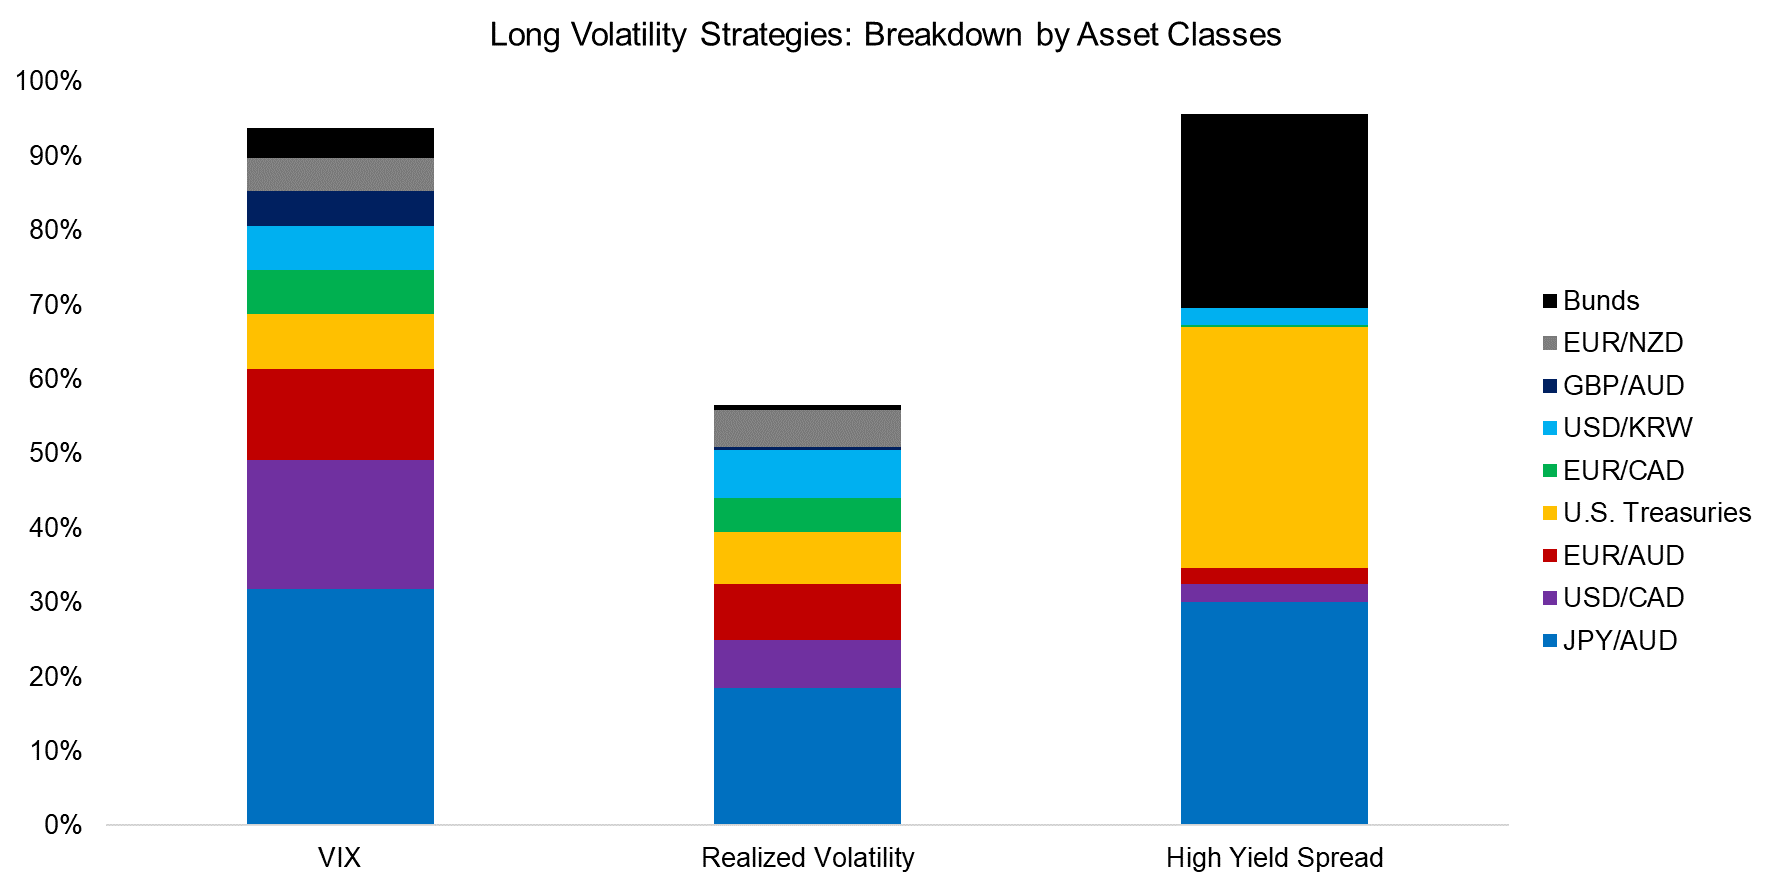 Long Volatility Strategies Breakdown by Asset Classes